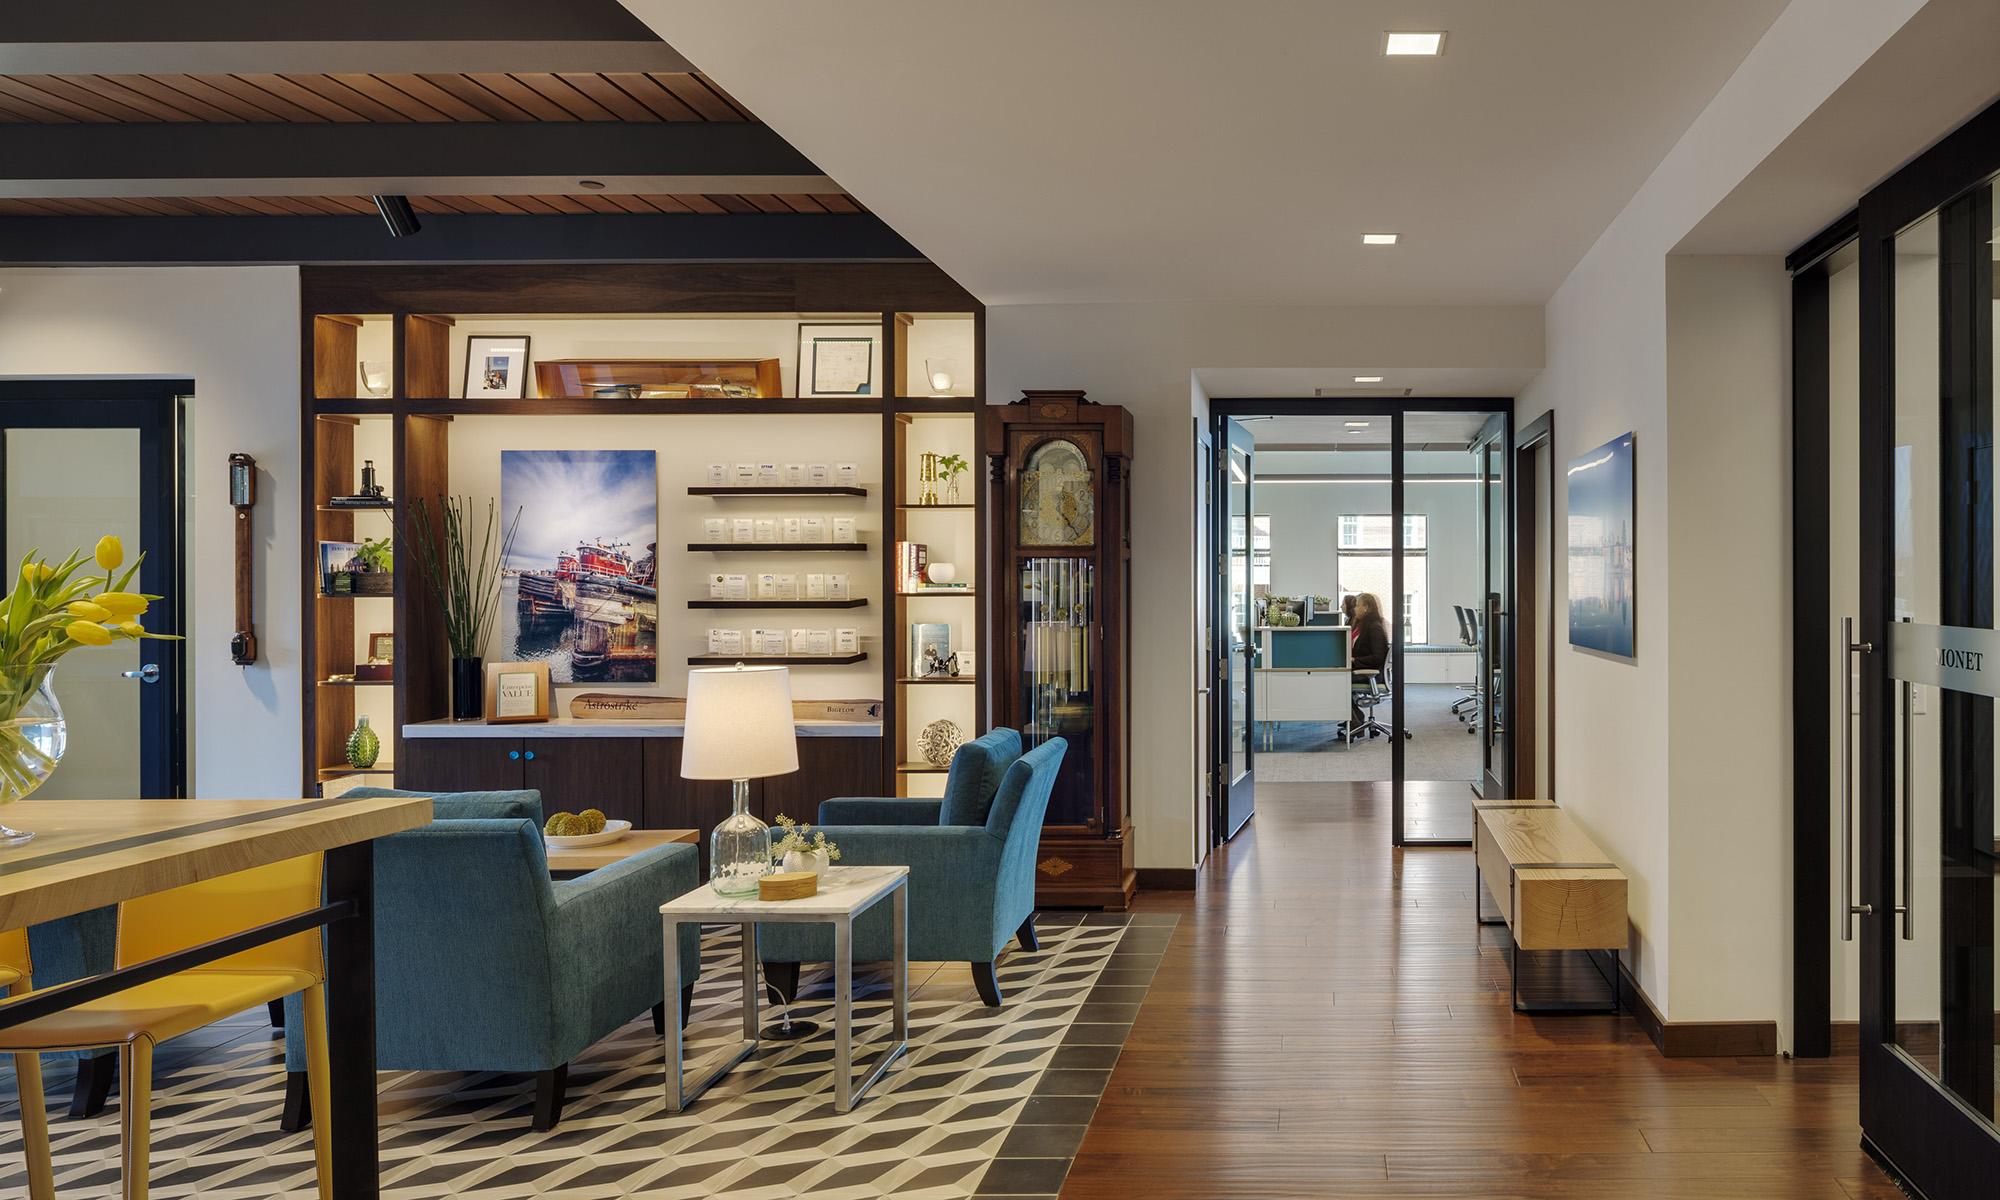 Interior Design School Burlington Vt